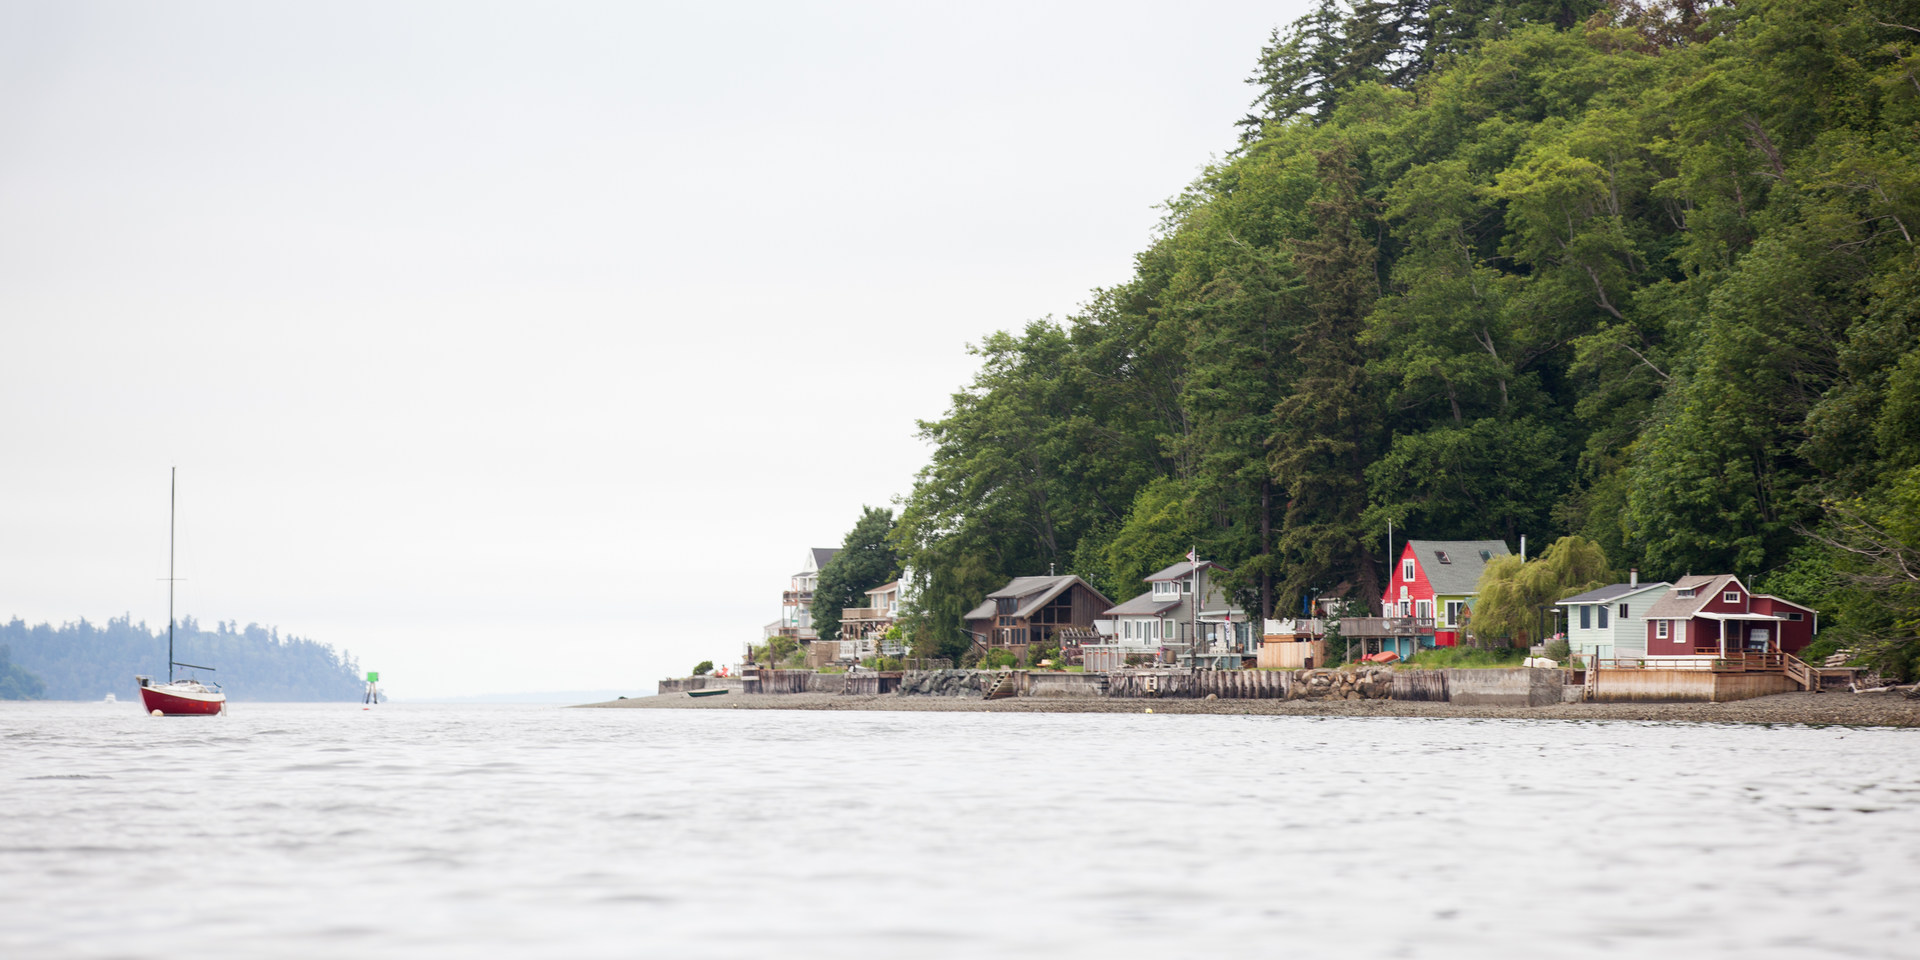 Camping Long Island Washington